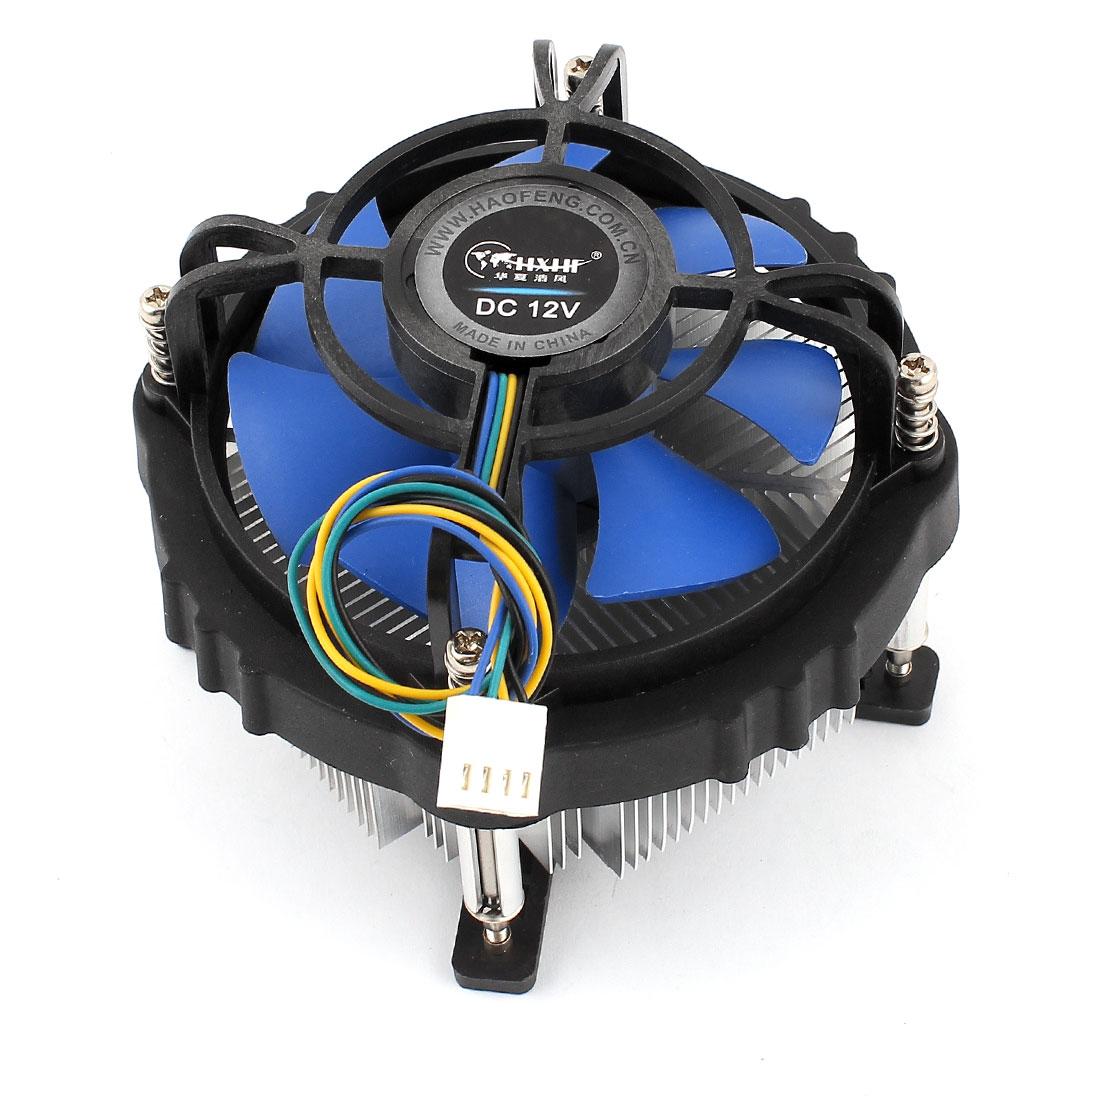 DC 12V 0.16A 40.9CFM 4Pins Connector CPU Cooler Cooling Fan Heatsink for LGA 775